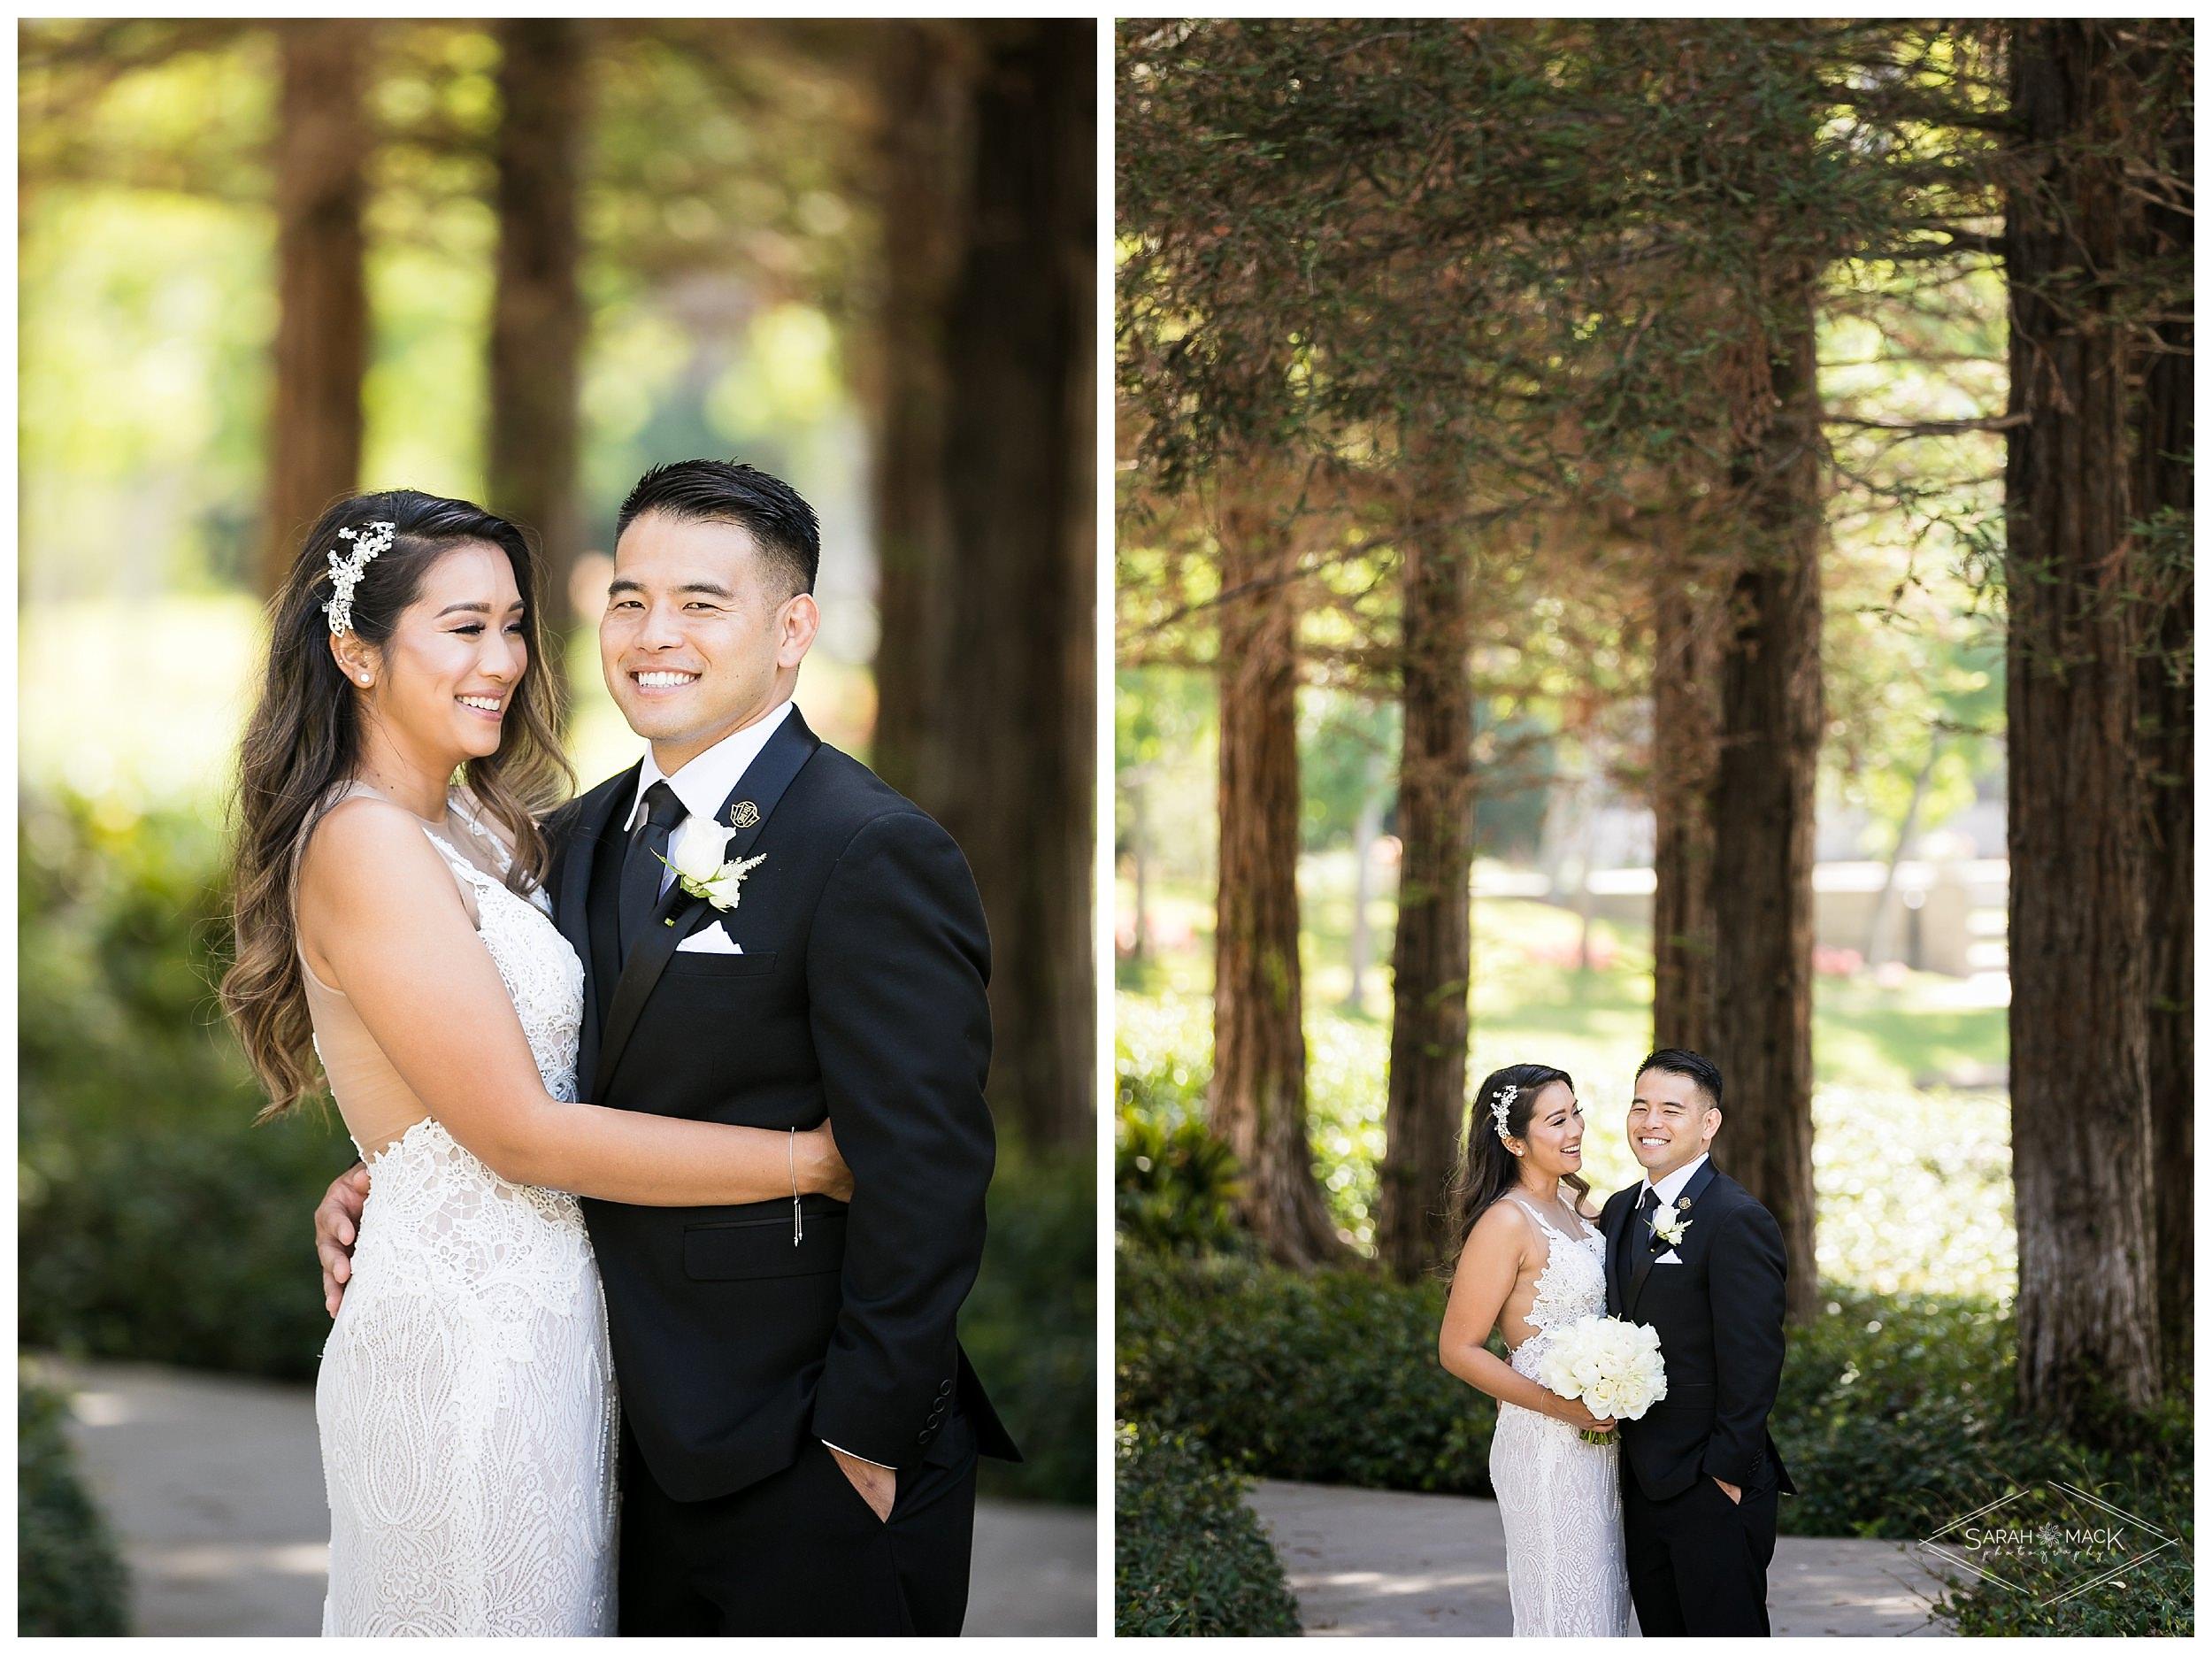 LE-Avenue-of-the-Arts-Costa-Mesa-Wedding-Photography-0082.jpg